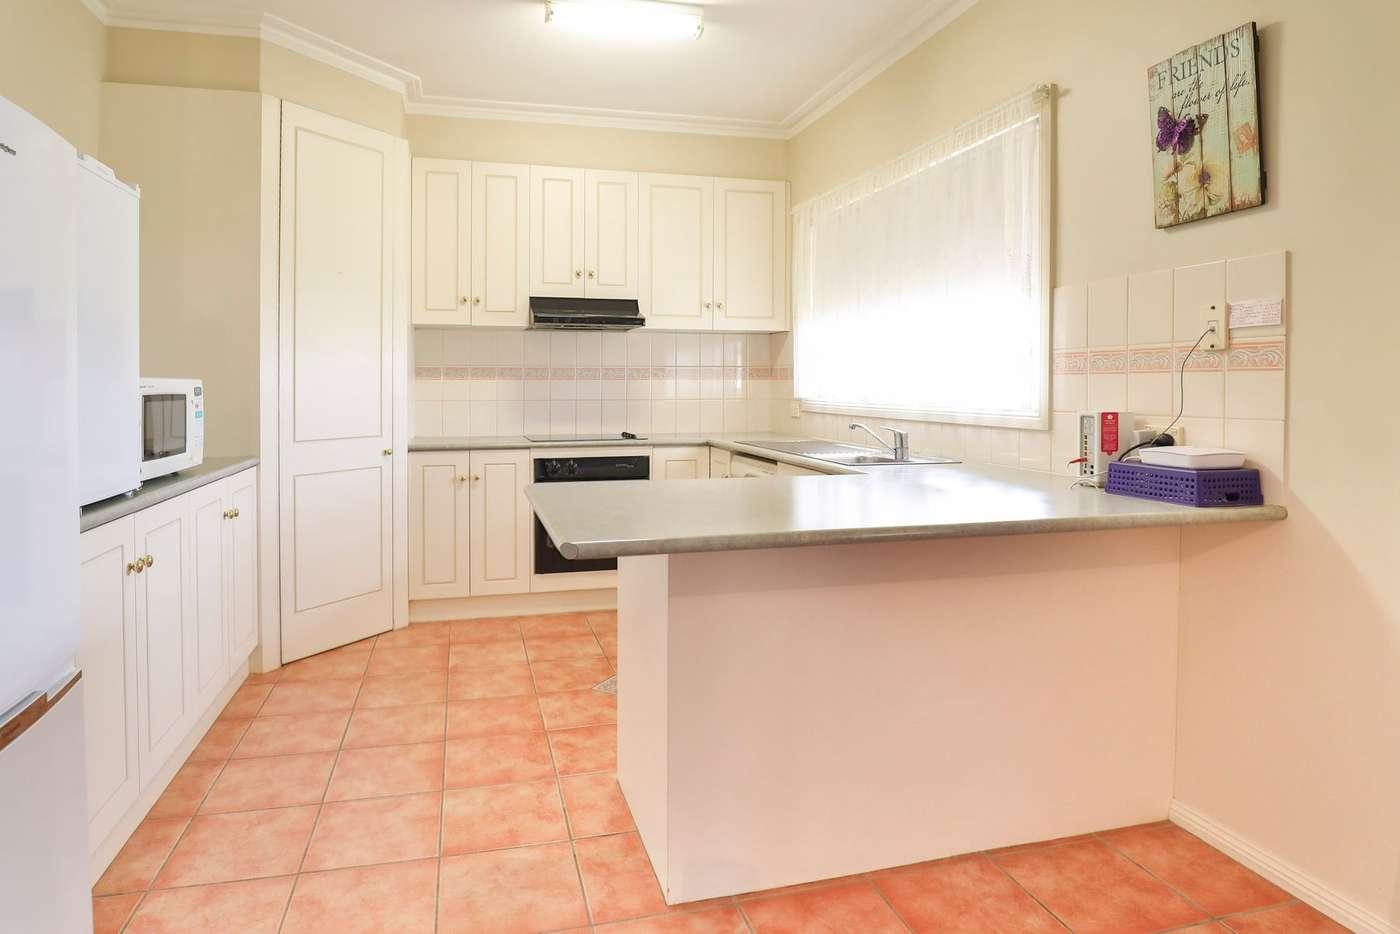 Fifth view of Homely house listing, 2 Plane Tree Drive, Mildura VIC 3500